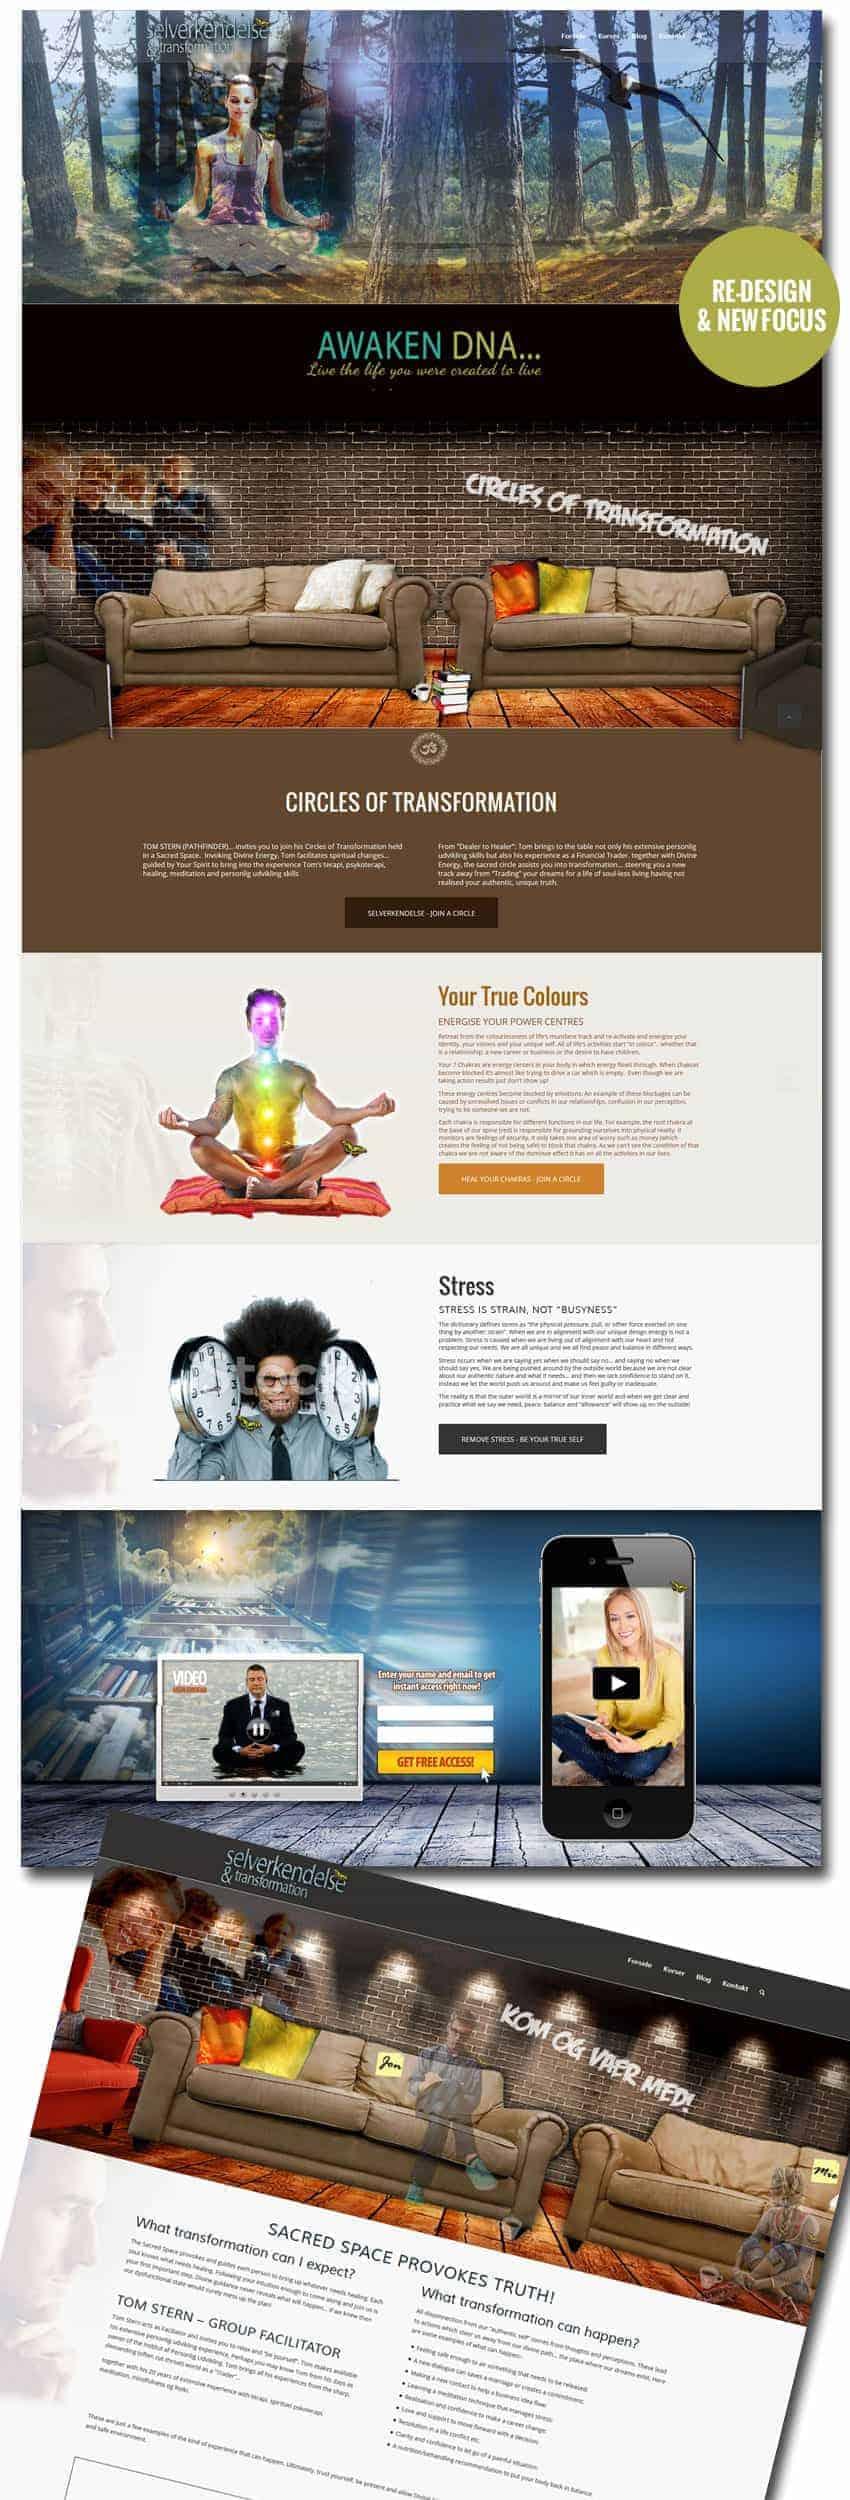 Nyt Enfold wordpress hjemmeside og design mockup